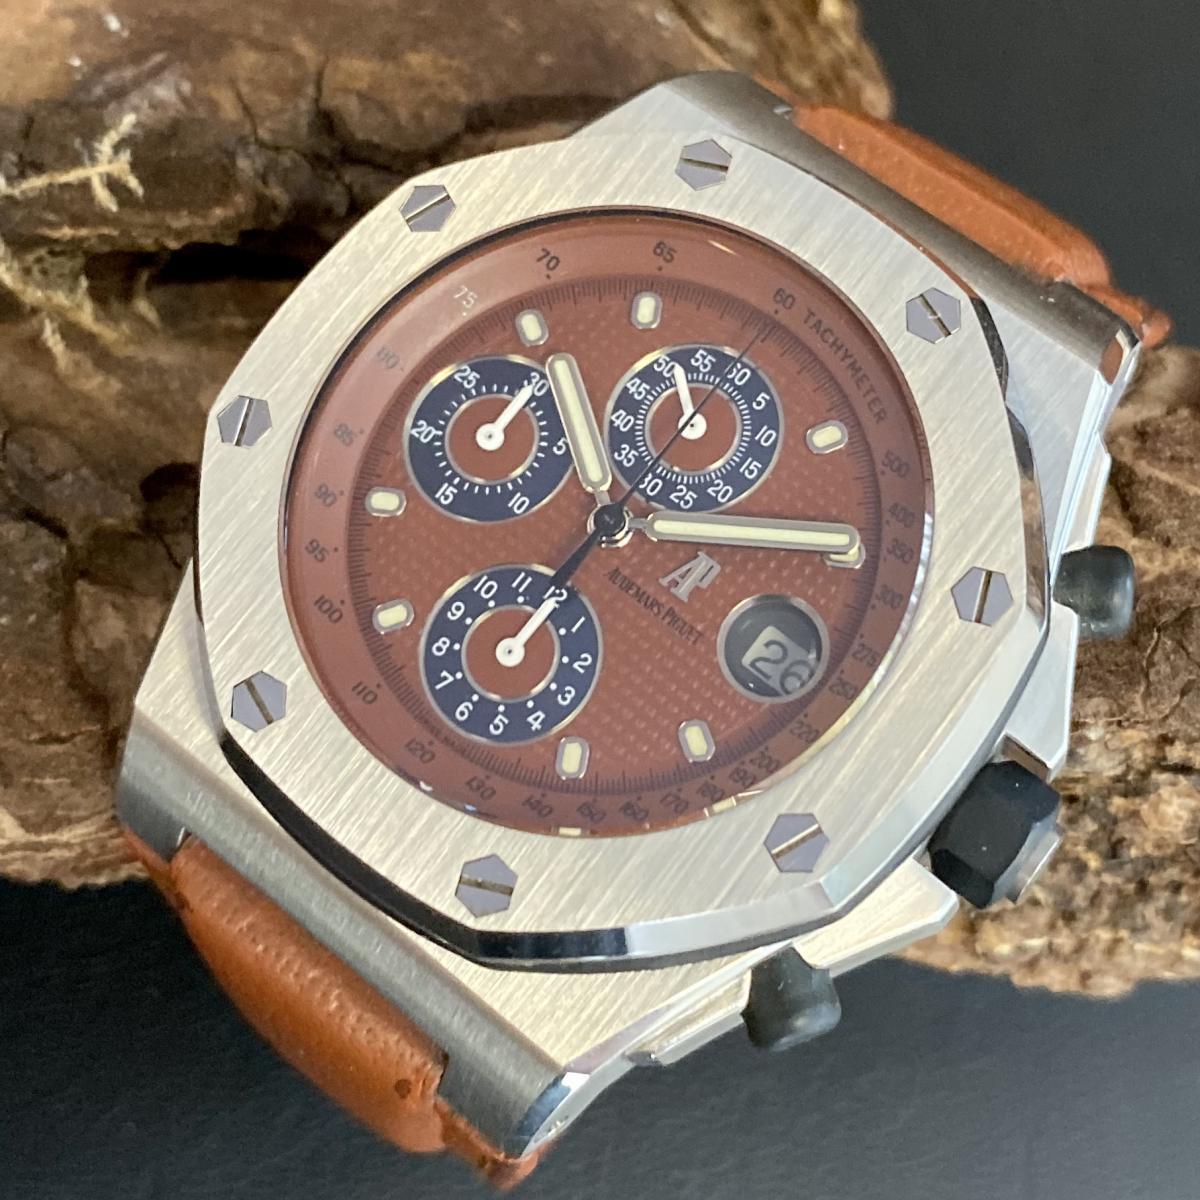 Audemars Piguet Offshore Chronograph 42mm Ref. 25770ST.O.0009